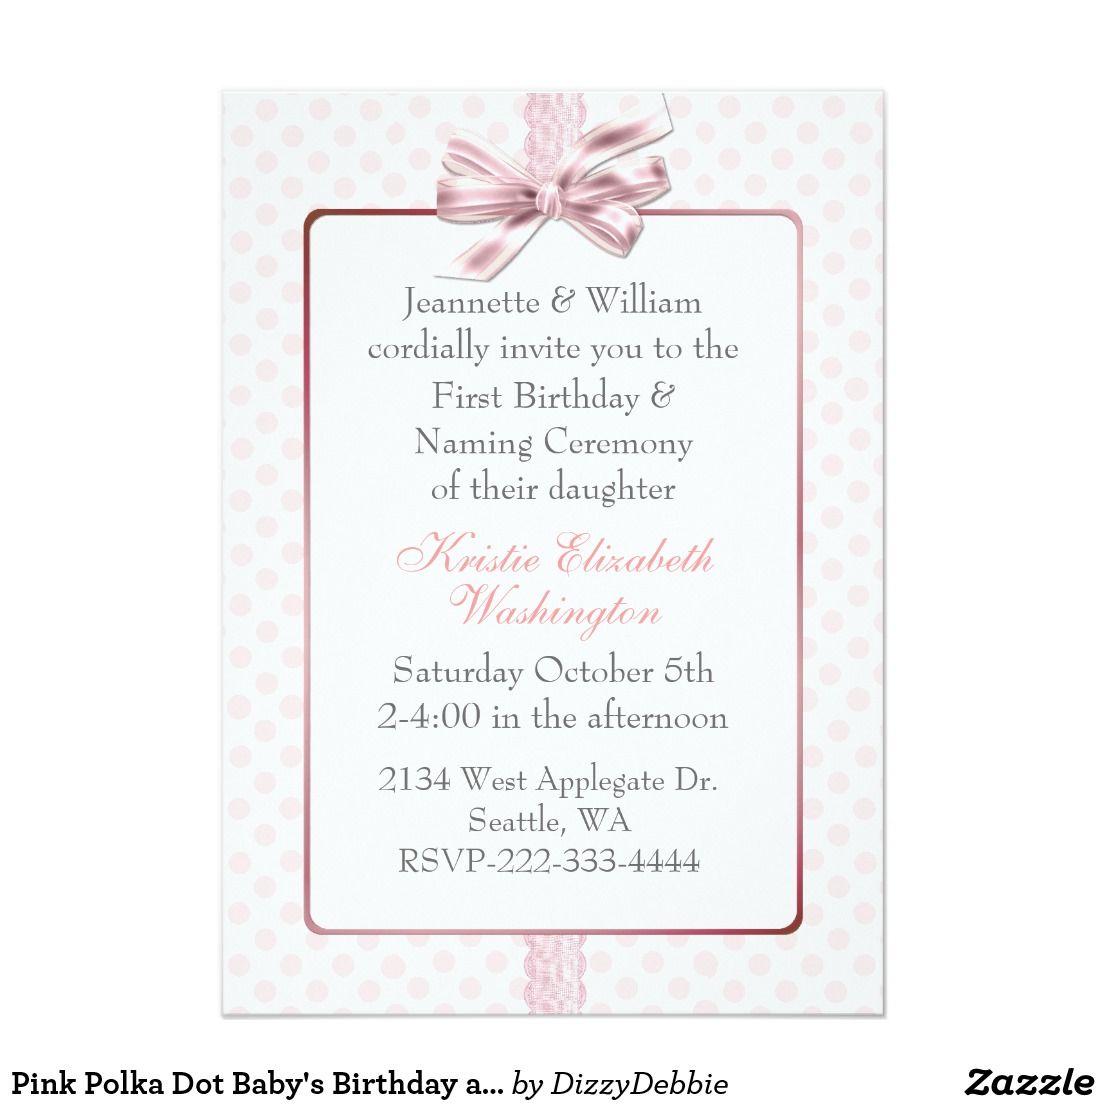 pink polka dot baby's birthday and naming ceremony